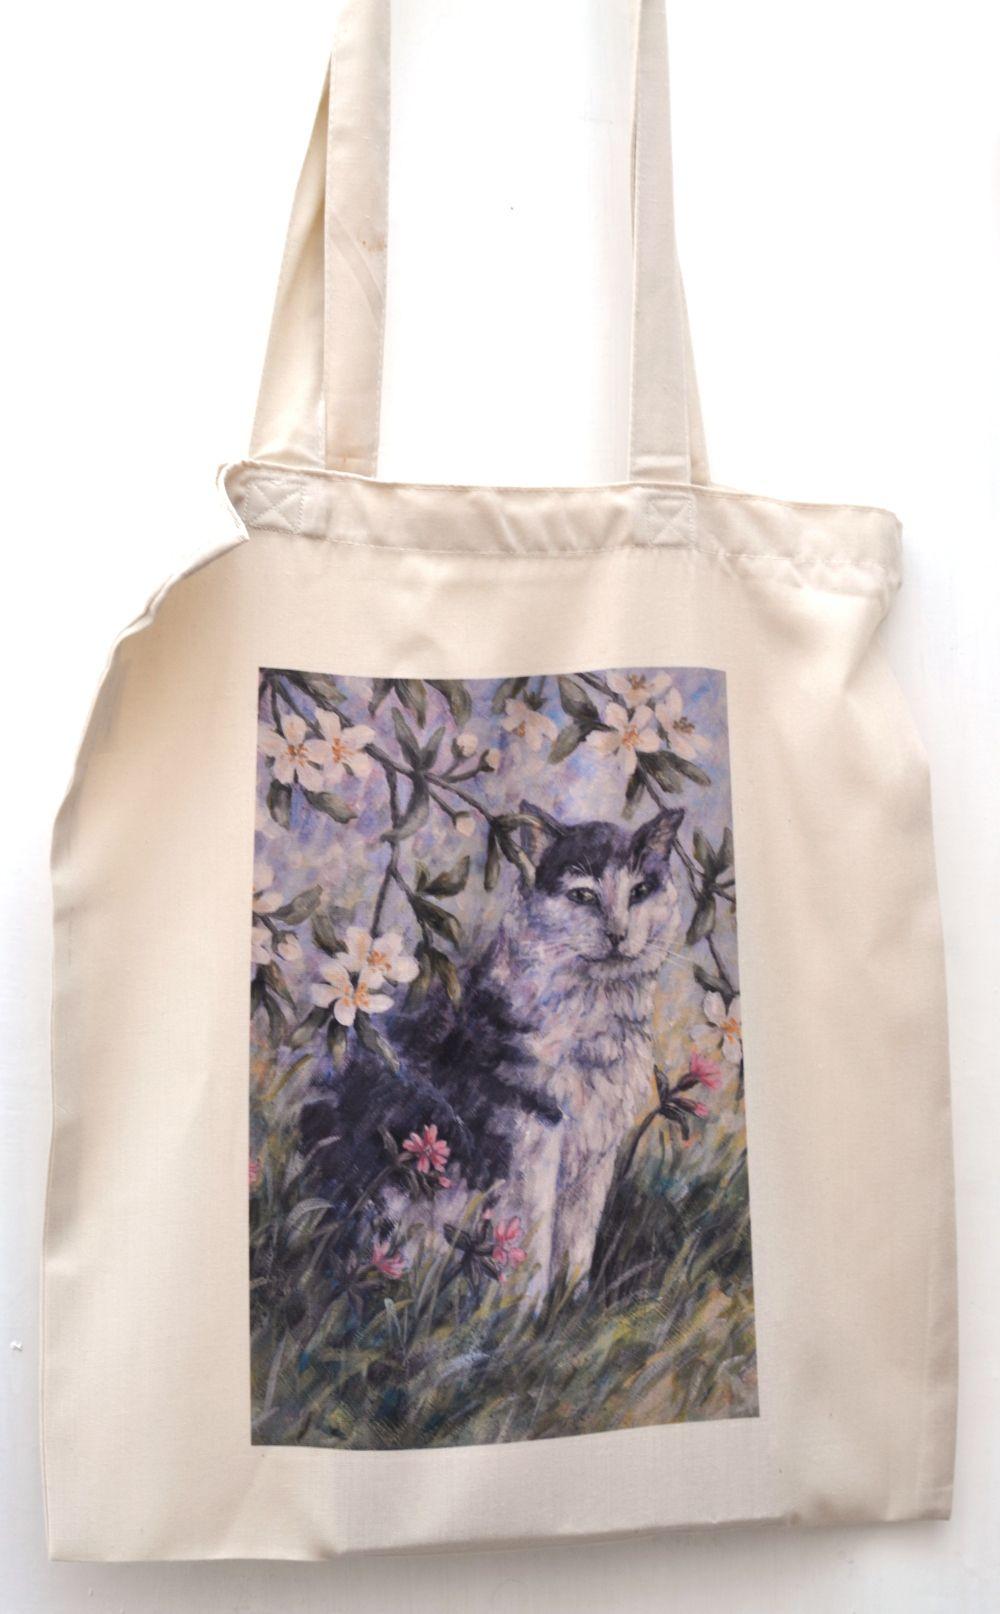 Bag - Beneath the Blossom